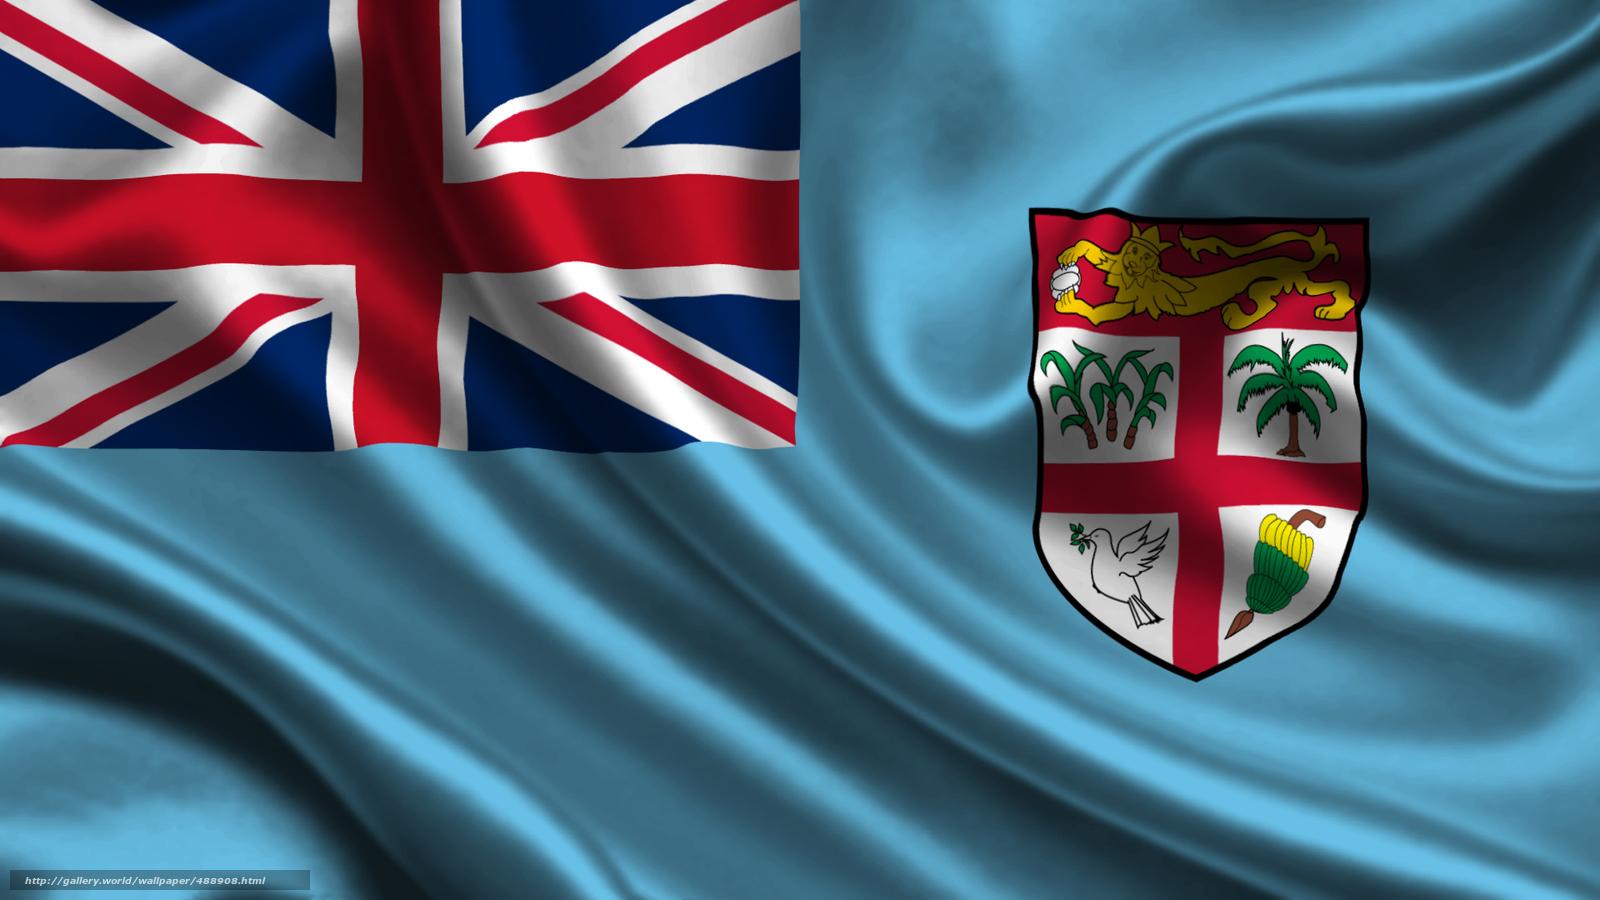 Download wallpaper fiji,  satin,  flag,  Fiji free desktop wallpaper in the resolution 1920x1080 — picture №488908